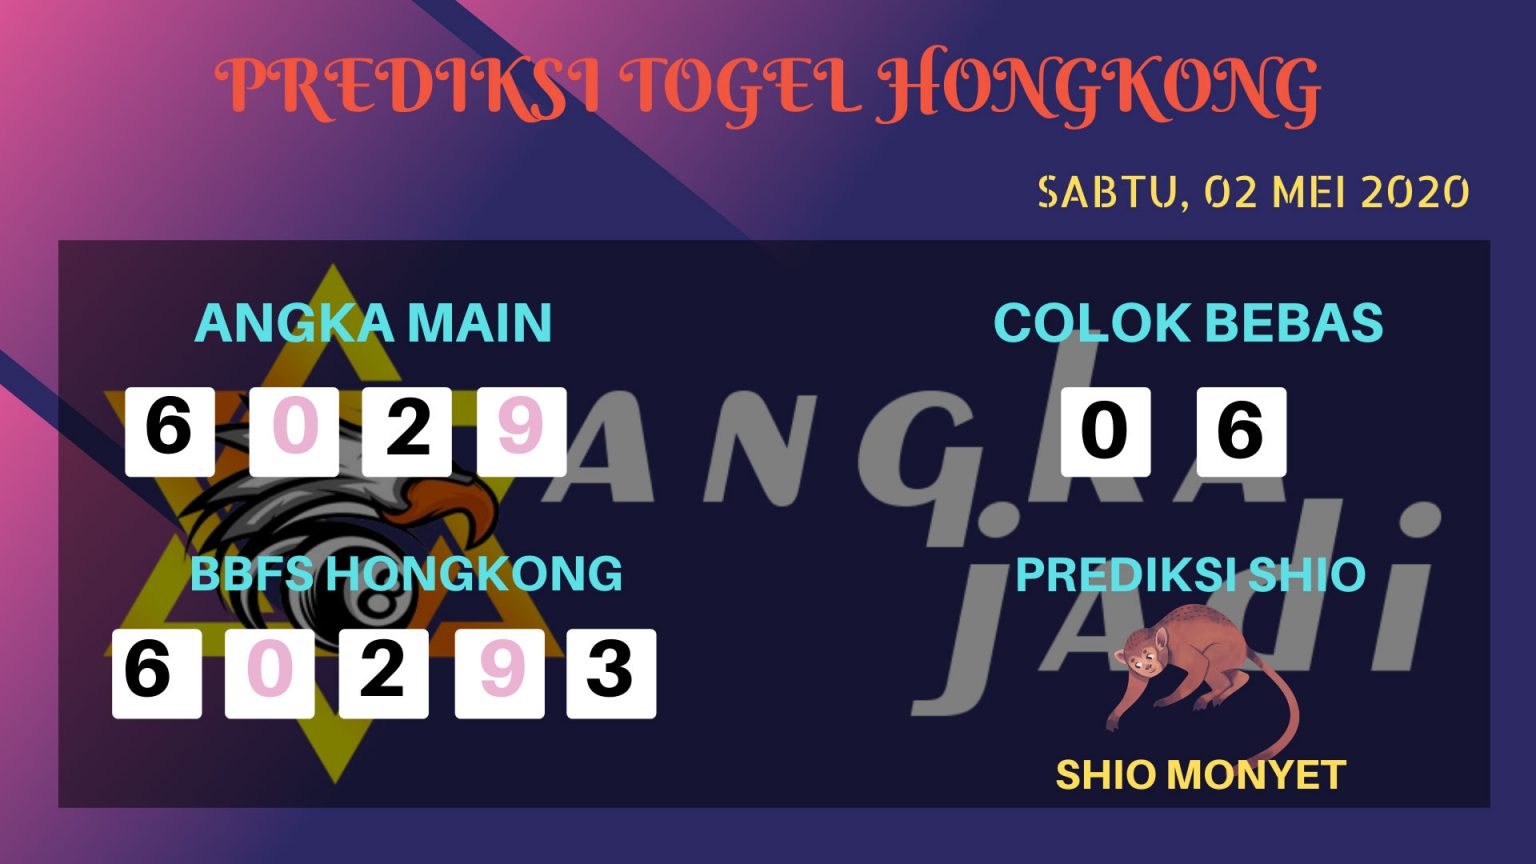 Prediksi Togel Hongkong 02 Mei 2020 - Prediksi Angka HK